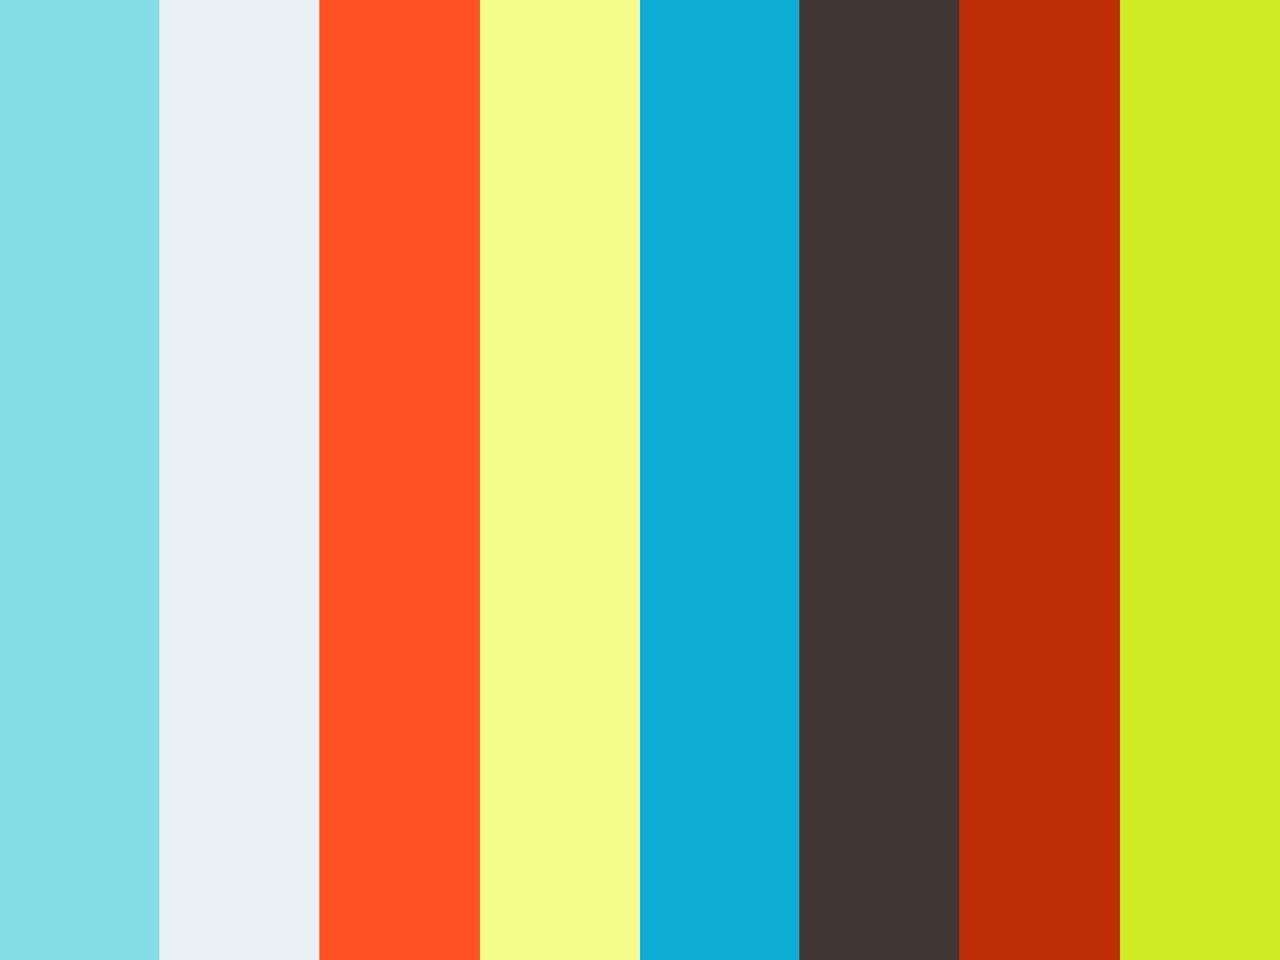 Splinter Cell Blacklist - Wii U Trailer